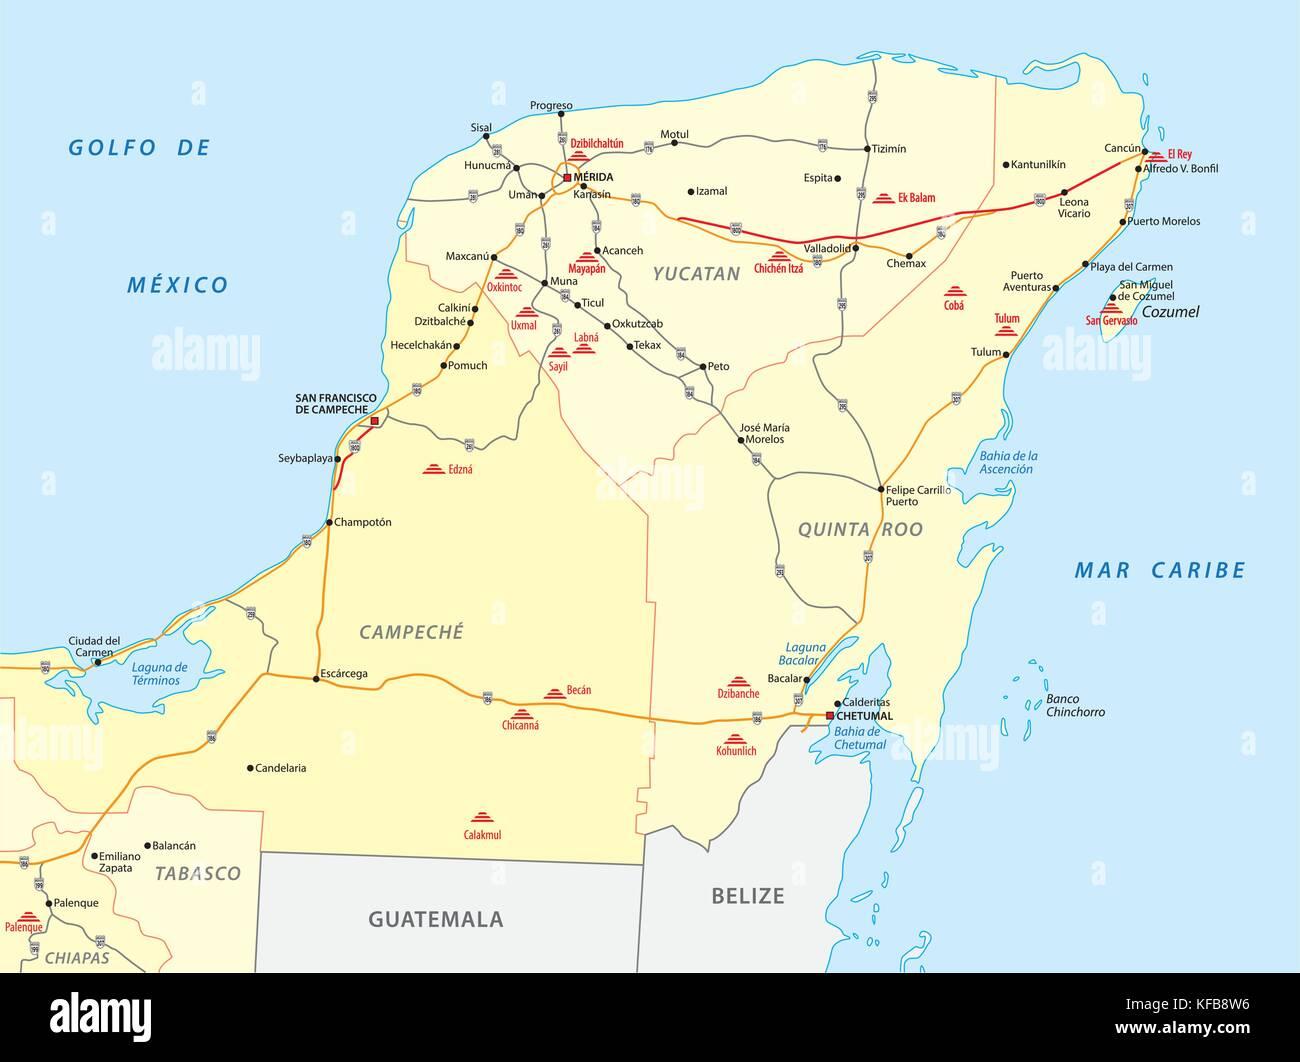 Map Of Yucatan Stock Photos & Map Of Yucatan Stock Images - Alamy Yucatan Map on zacatecas map, oaxaca map, pampas map, mahahual map, baja map, cozumel map, cancun map, belize map, merida map, quintana roo map, mexico map, riviera maya map, tenochtitlan map, puerto rico map, chiapas map, hawaii map, campeche map, mesoamerica map, panama map, guadalajara map,